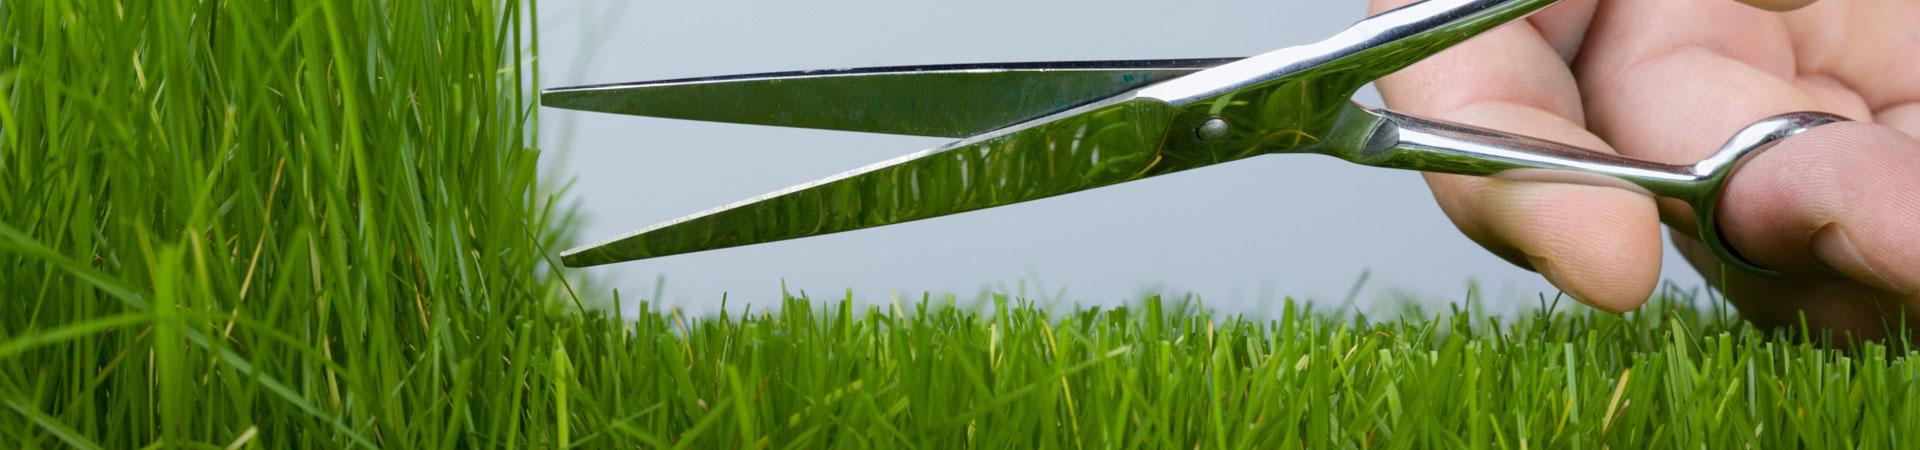 scissor-cutting-grass